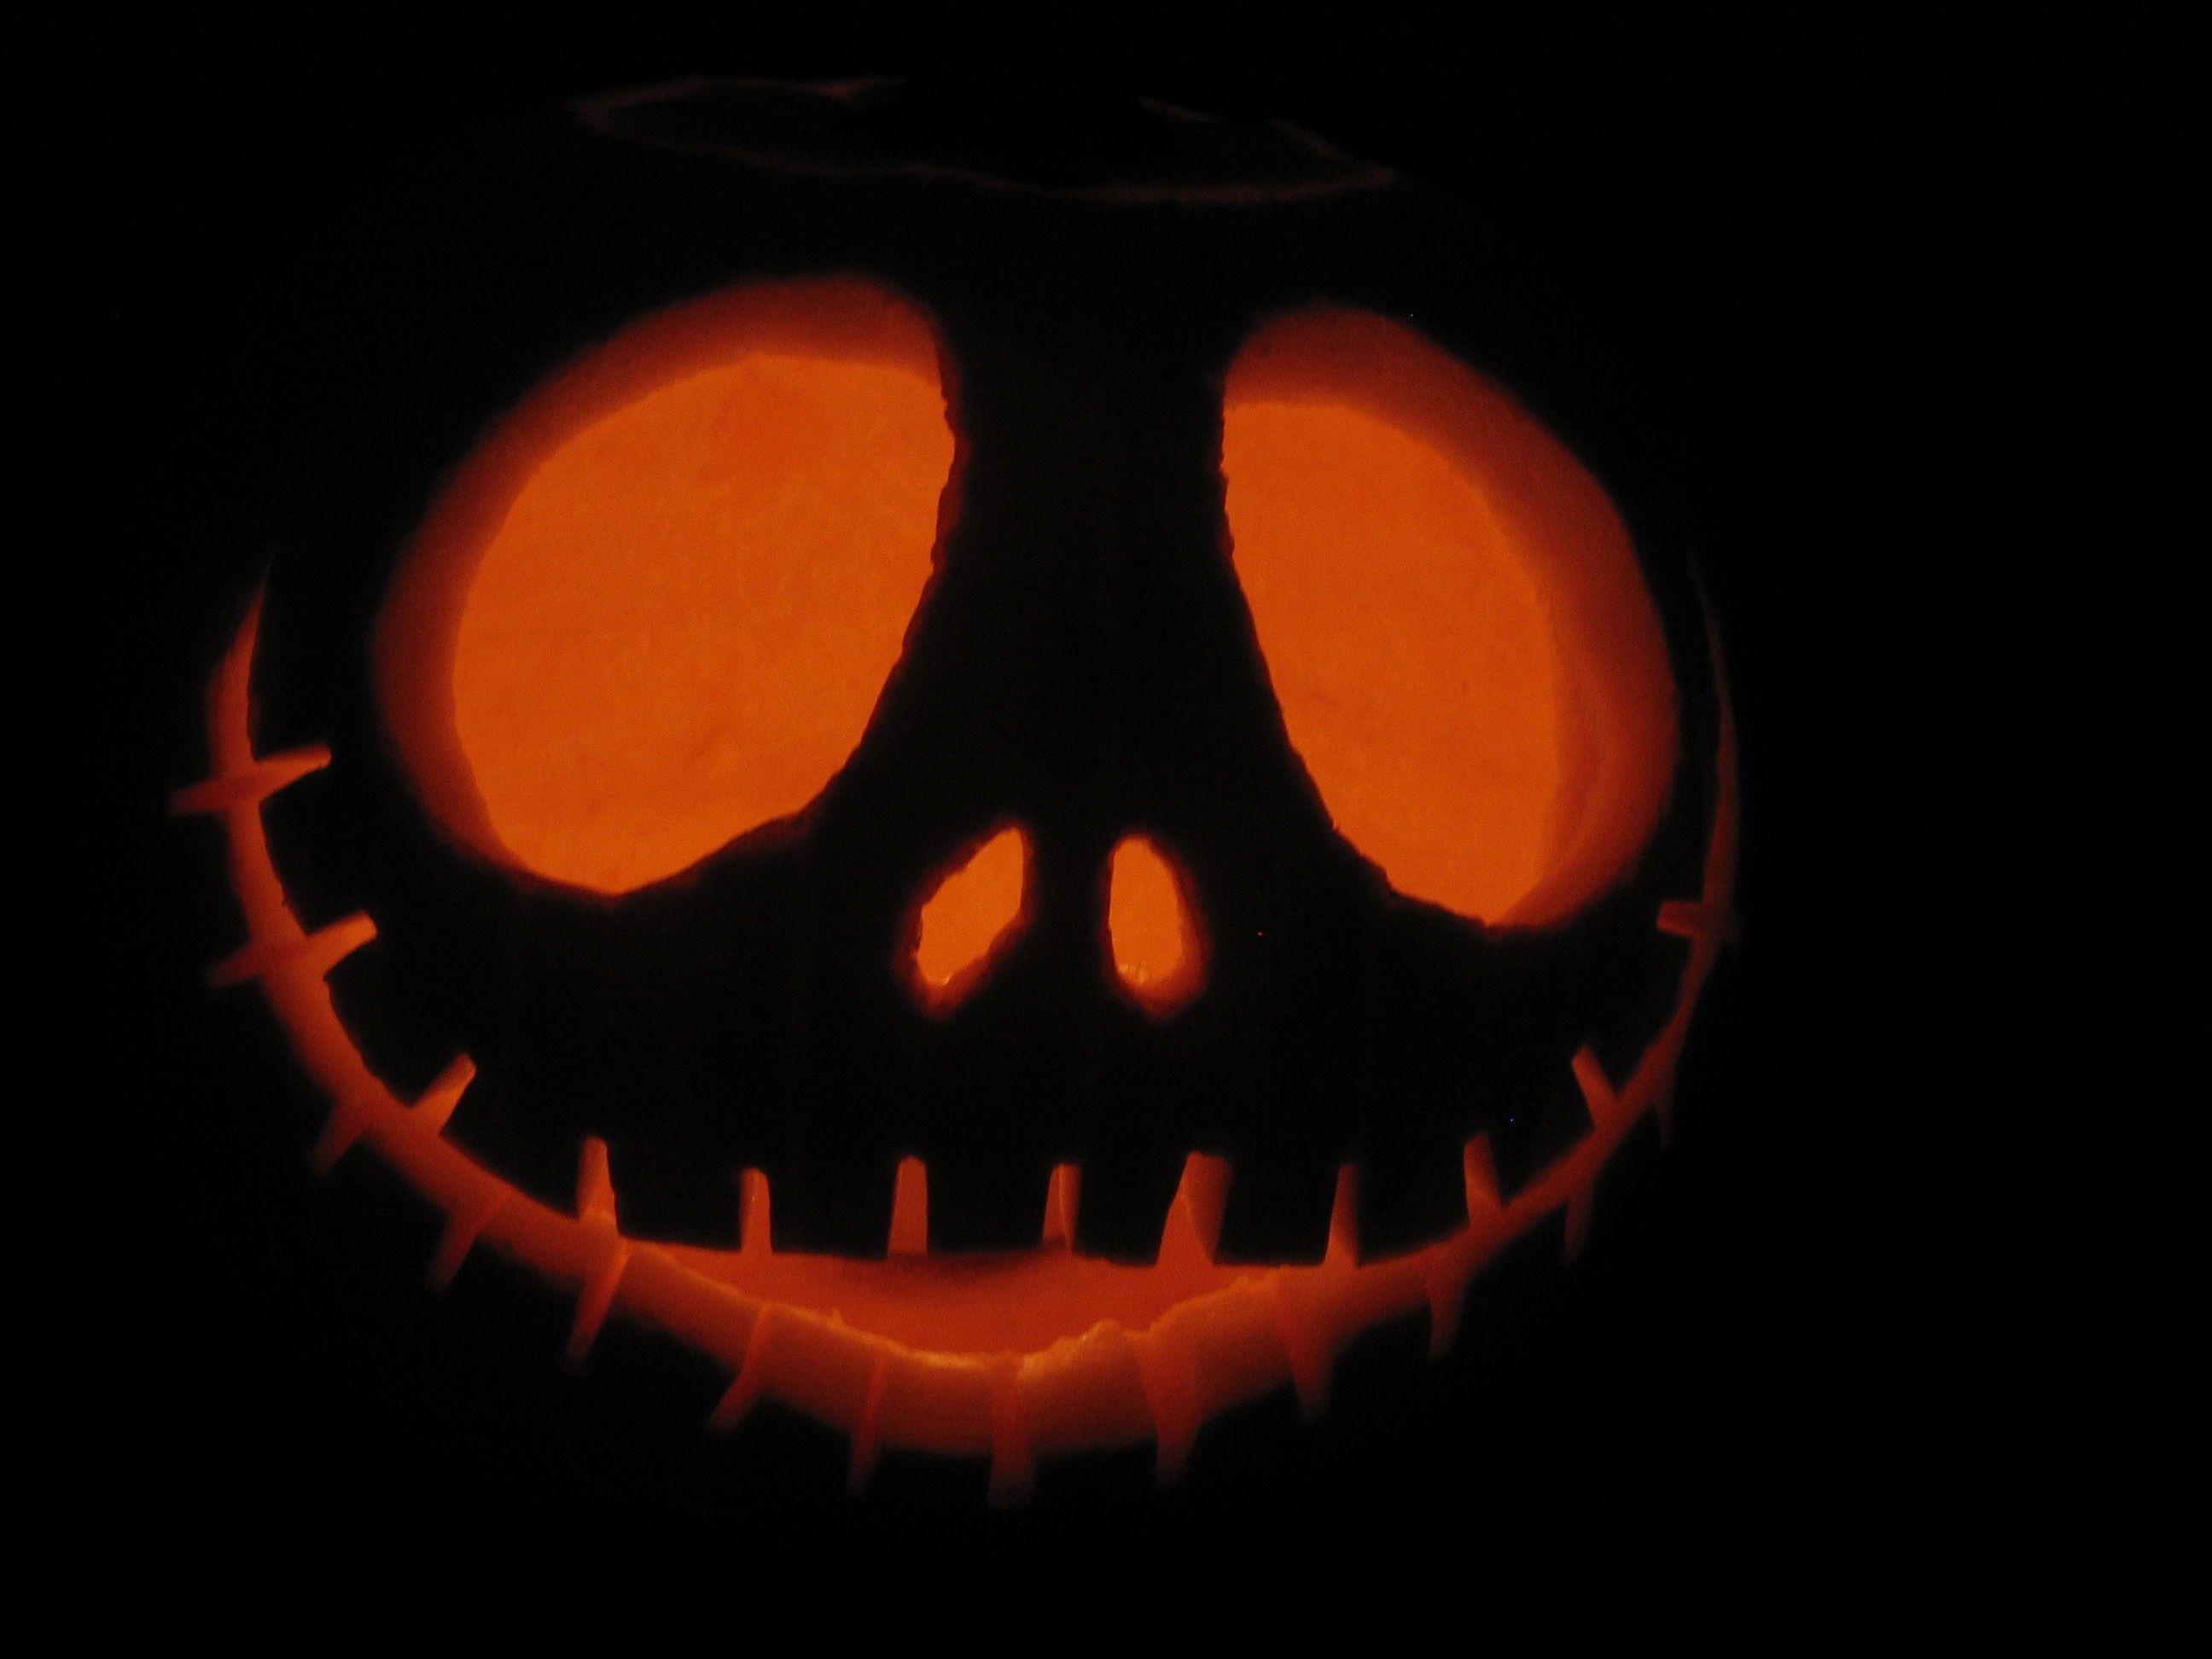 Jack o lantern free patterns - 17 Best Images About Jack O Lanterns And Carved Pumpkins On Pinterest Pumpkins Happy Halloween And Jack O Connell